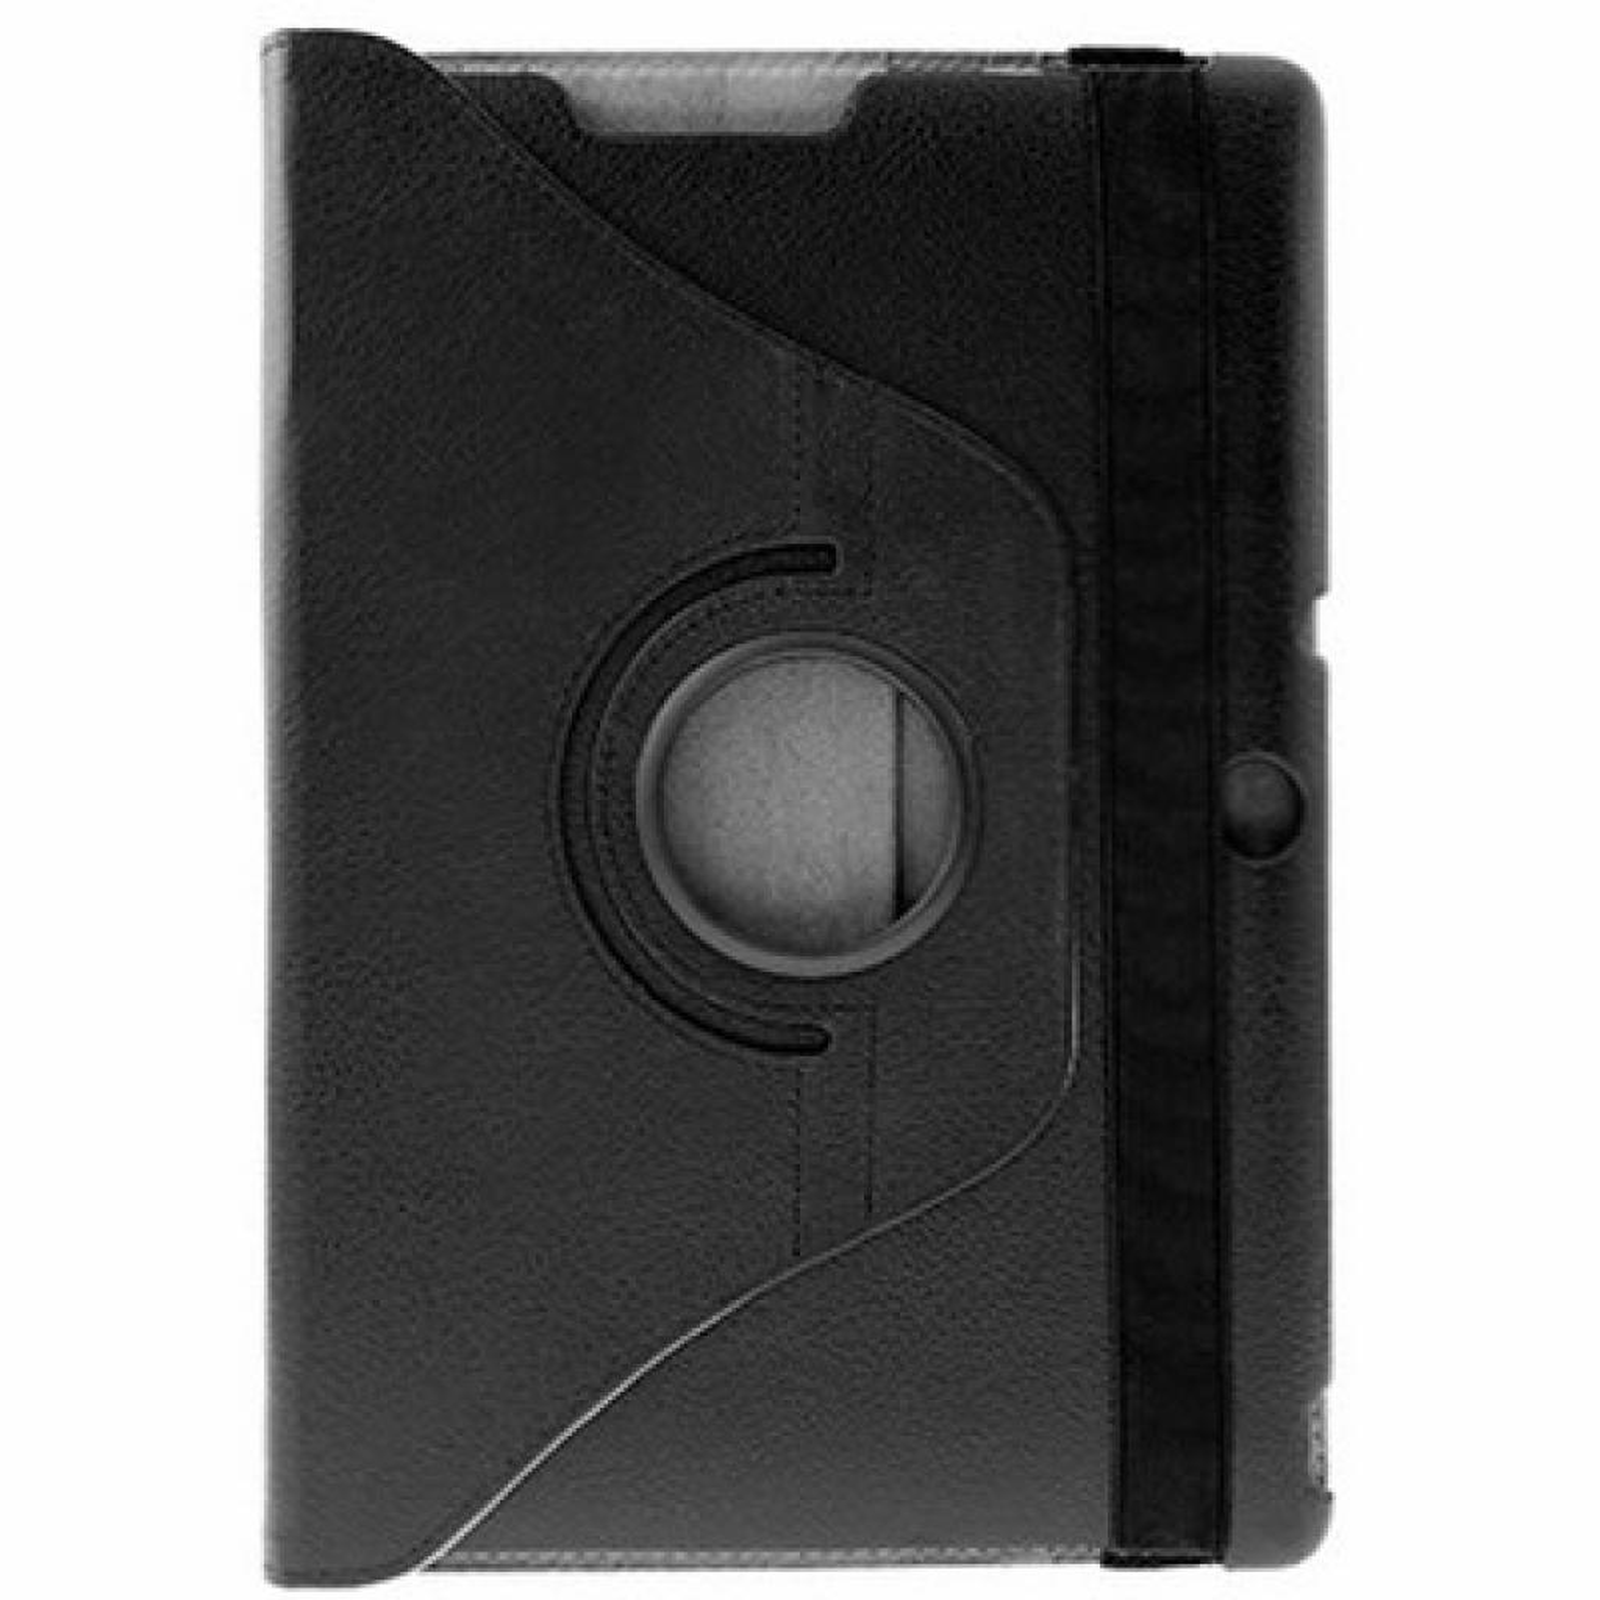 Чехол для планшета Drobak 10.1 ASUS TF300 /Black/ ротатор (218964)